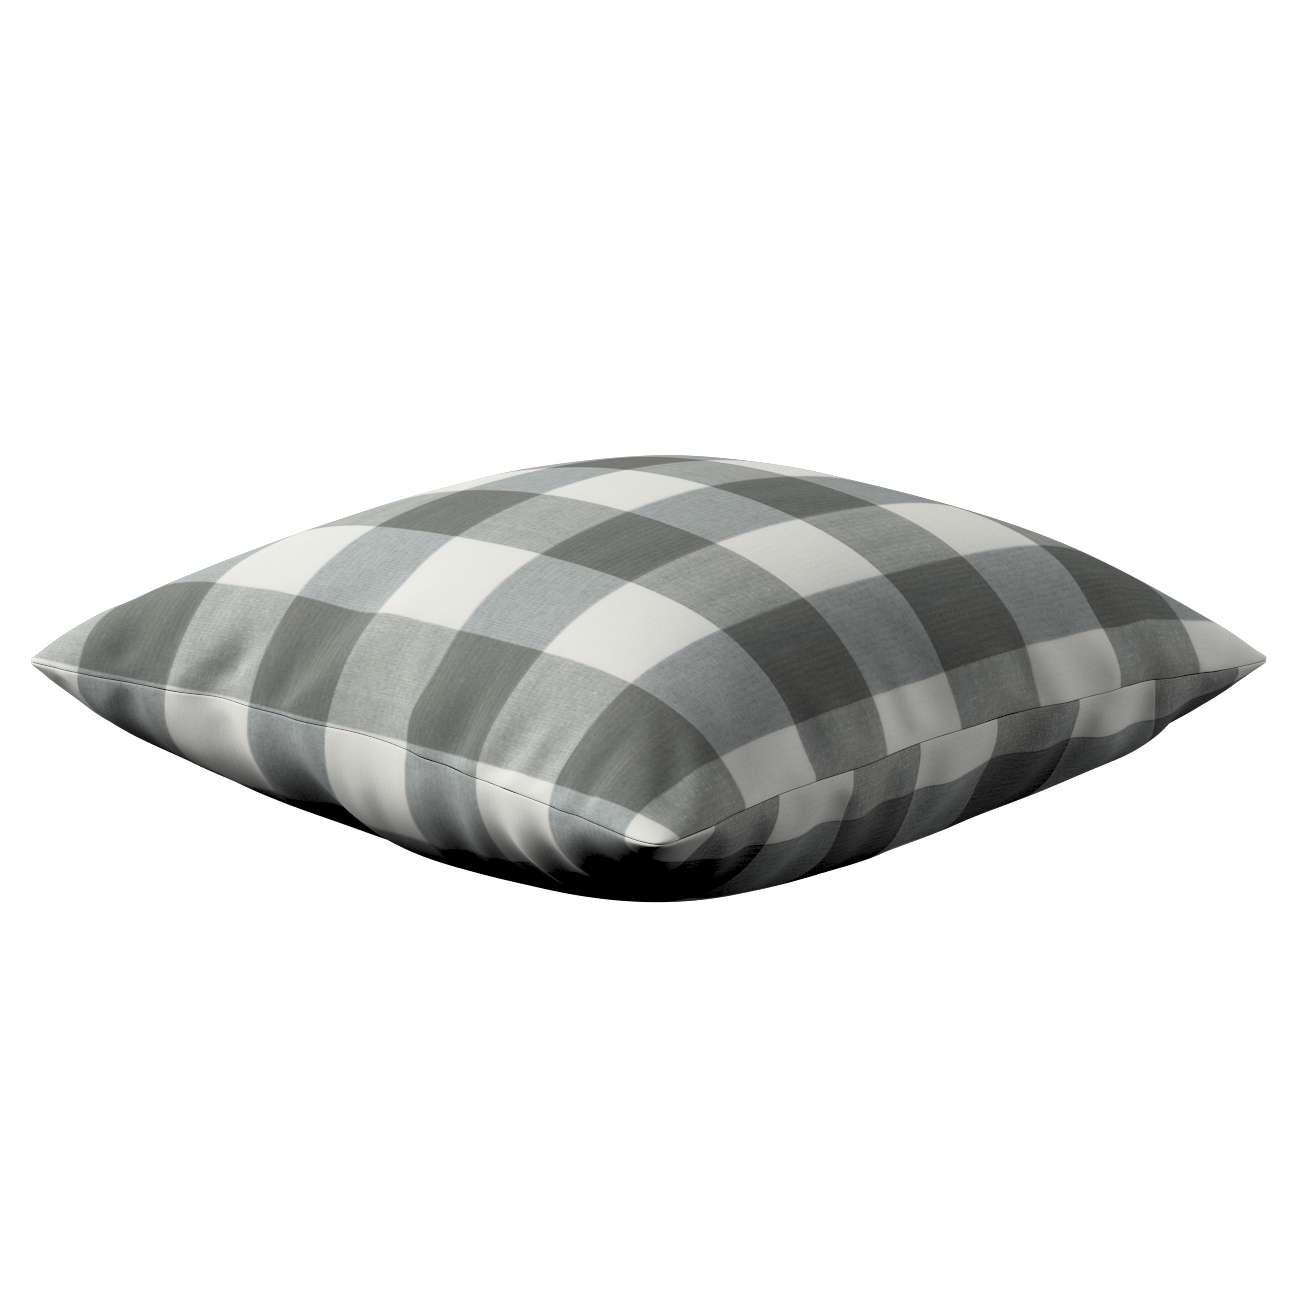 Kinga cushion cover in collection Quadro, fabric: 136-13